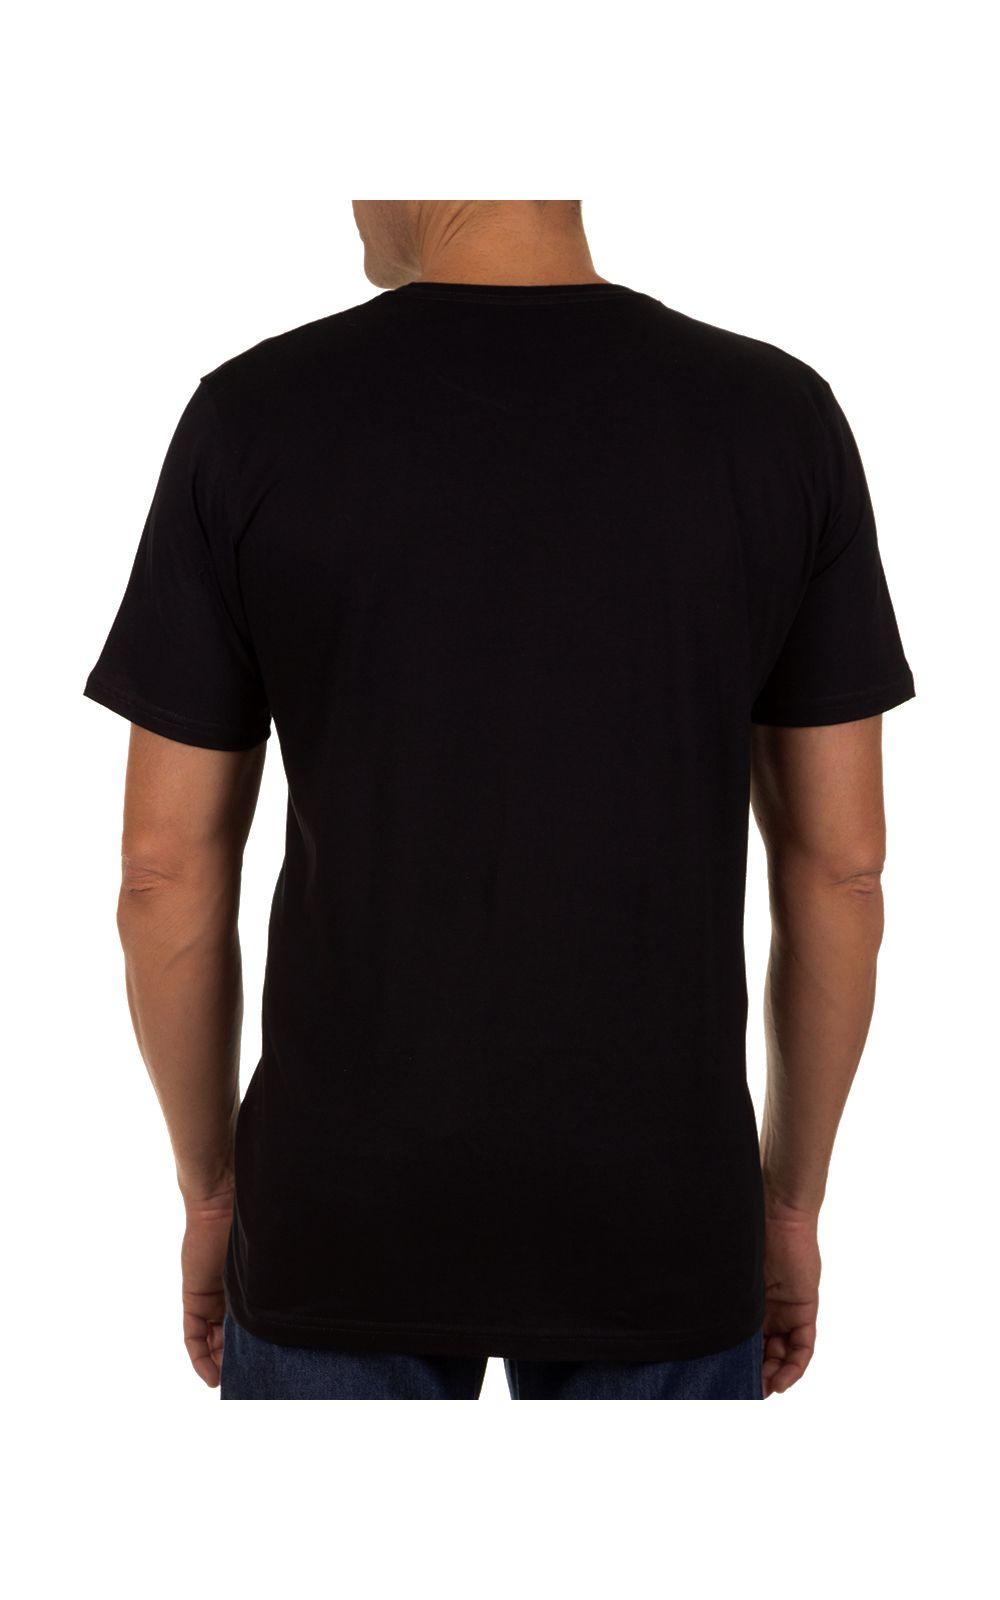 Foto 2 - Camiseta Masculina Preto Lisa